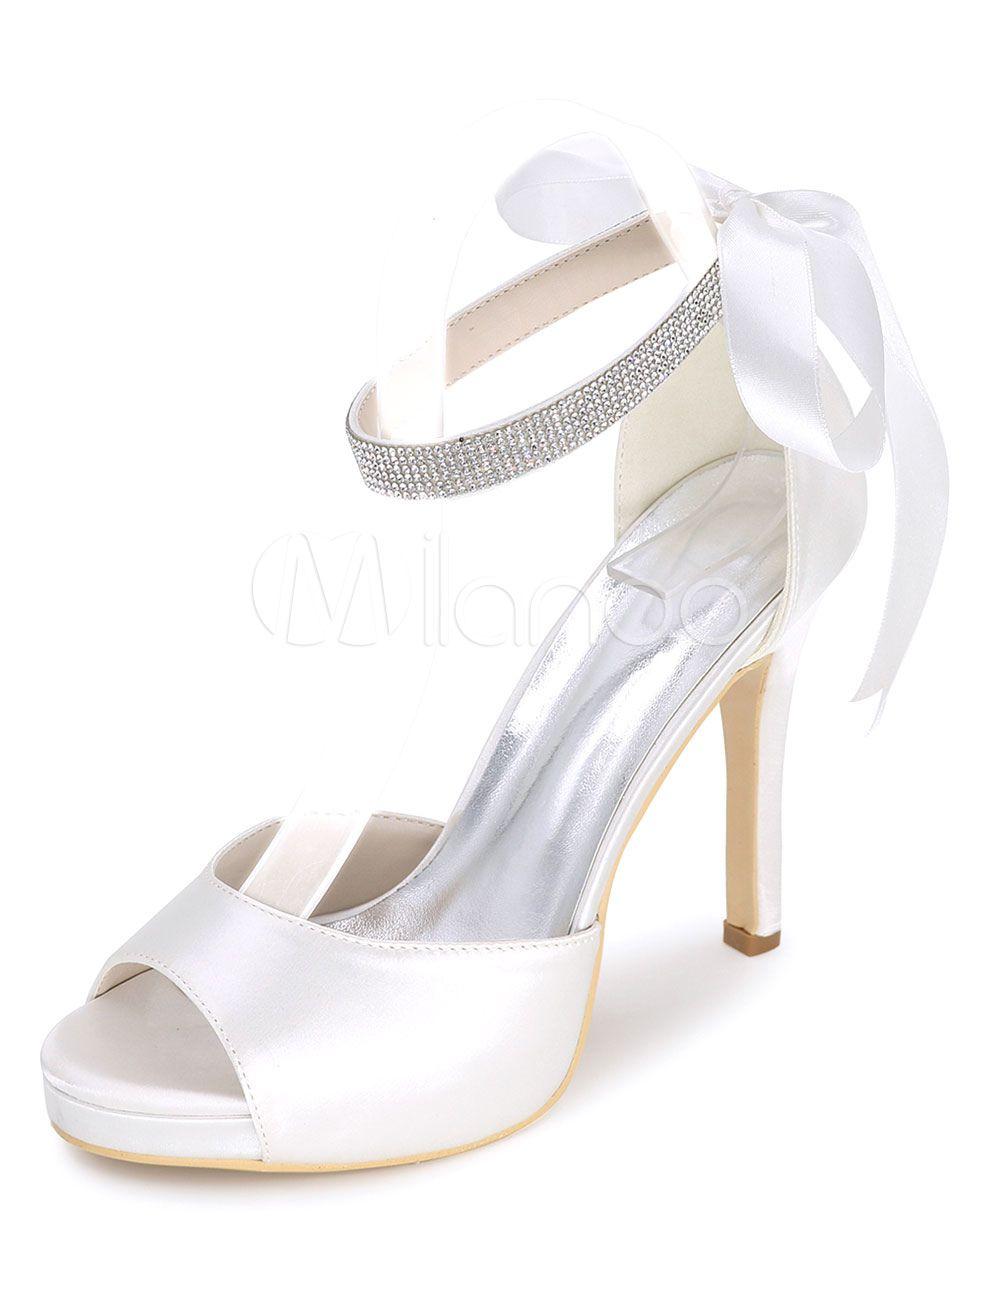 f577c456f6 Platform Wedding Shoes Satin Sandals Women's High Heel Ankle Strap ...